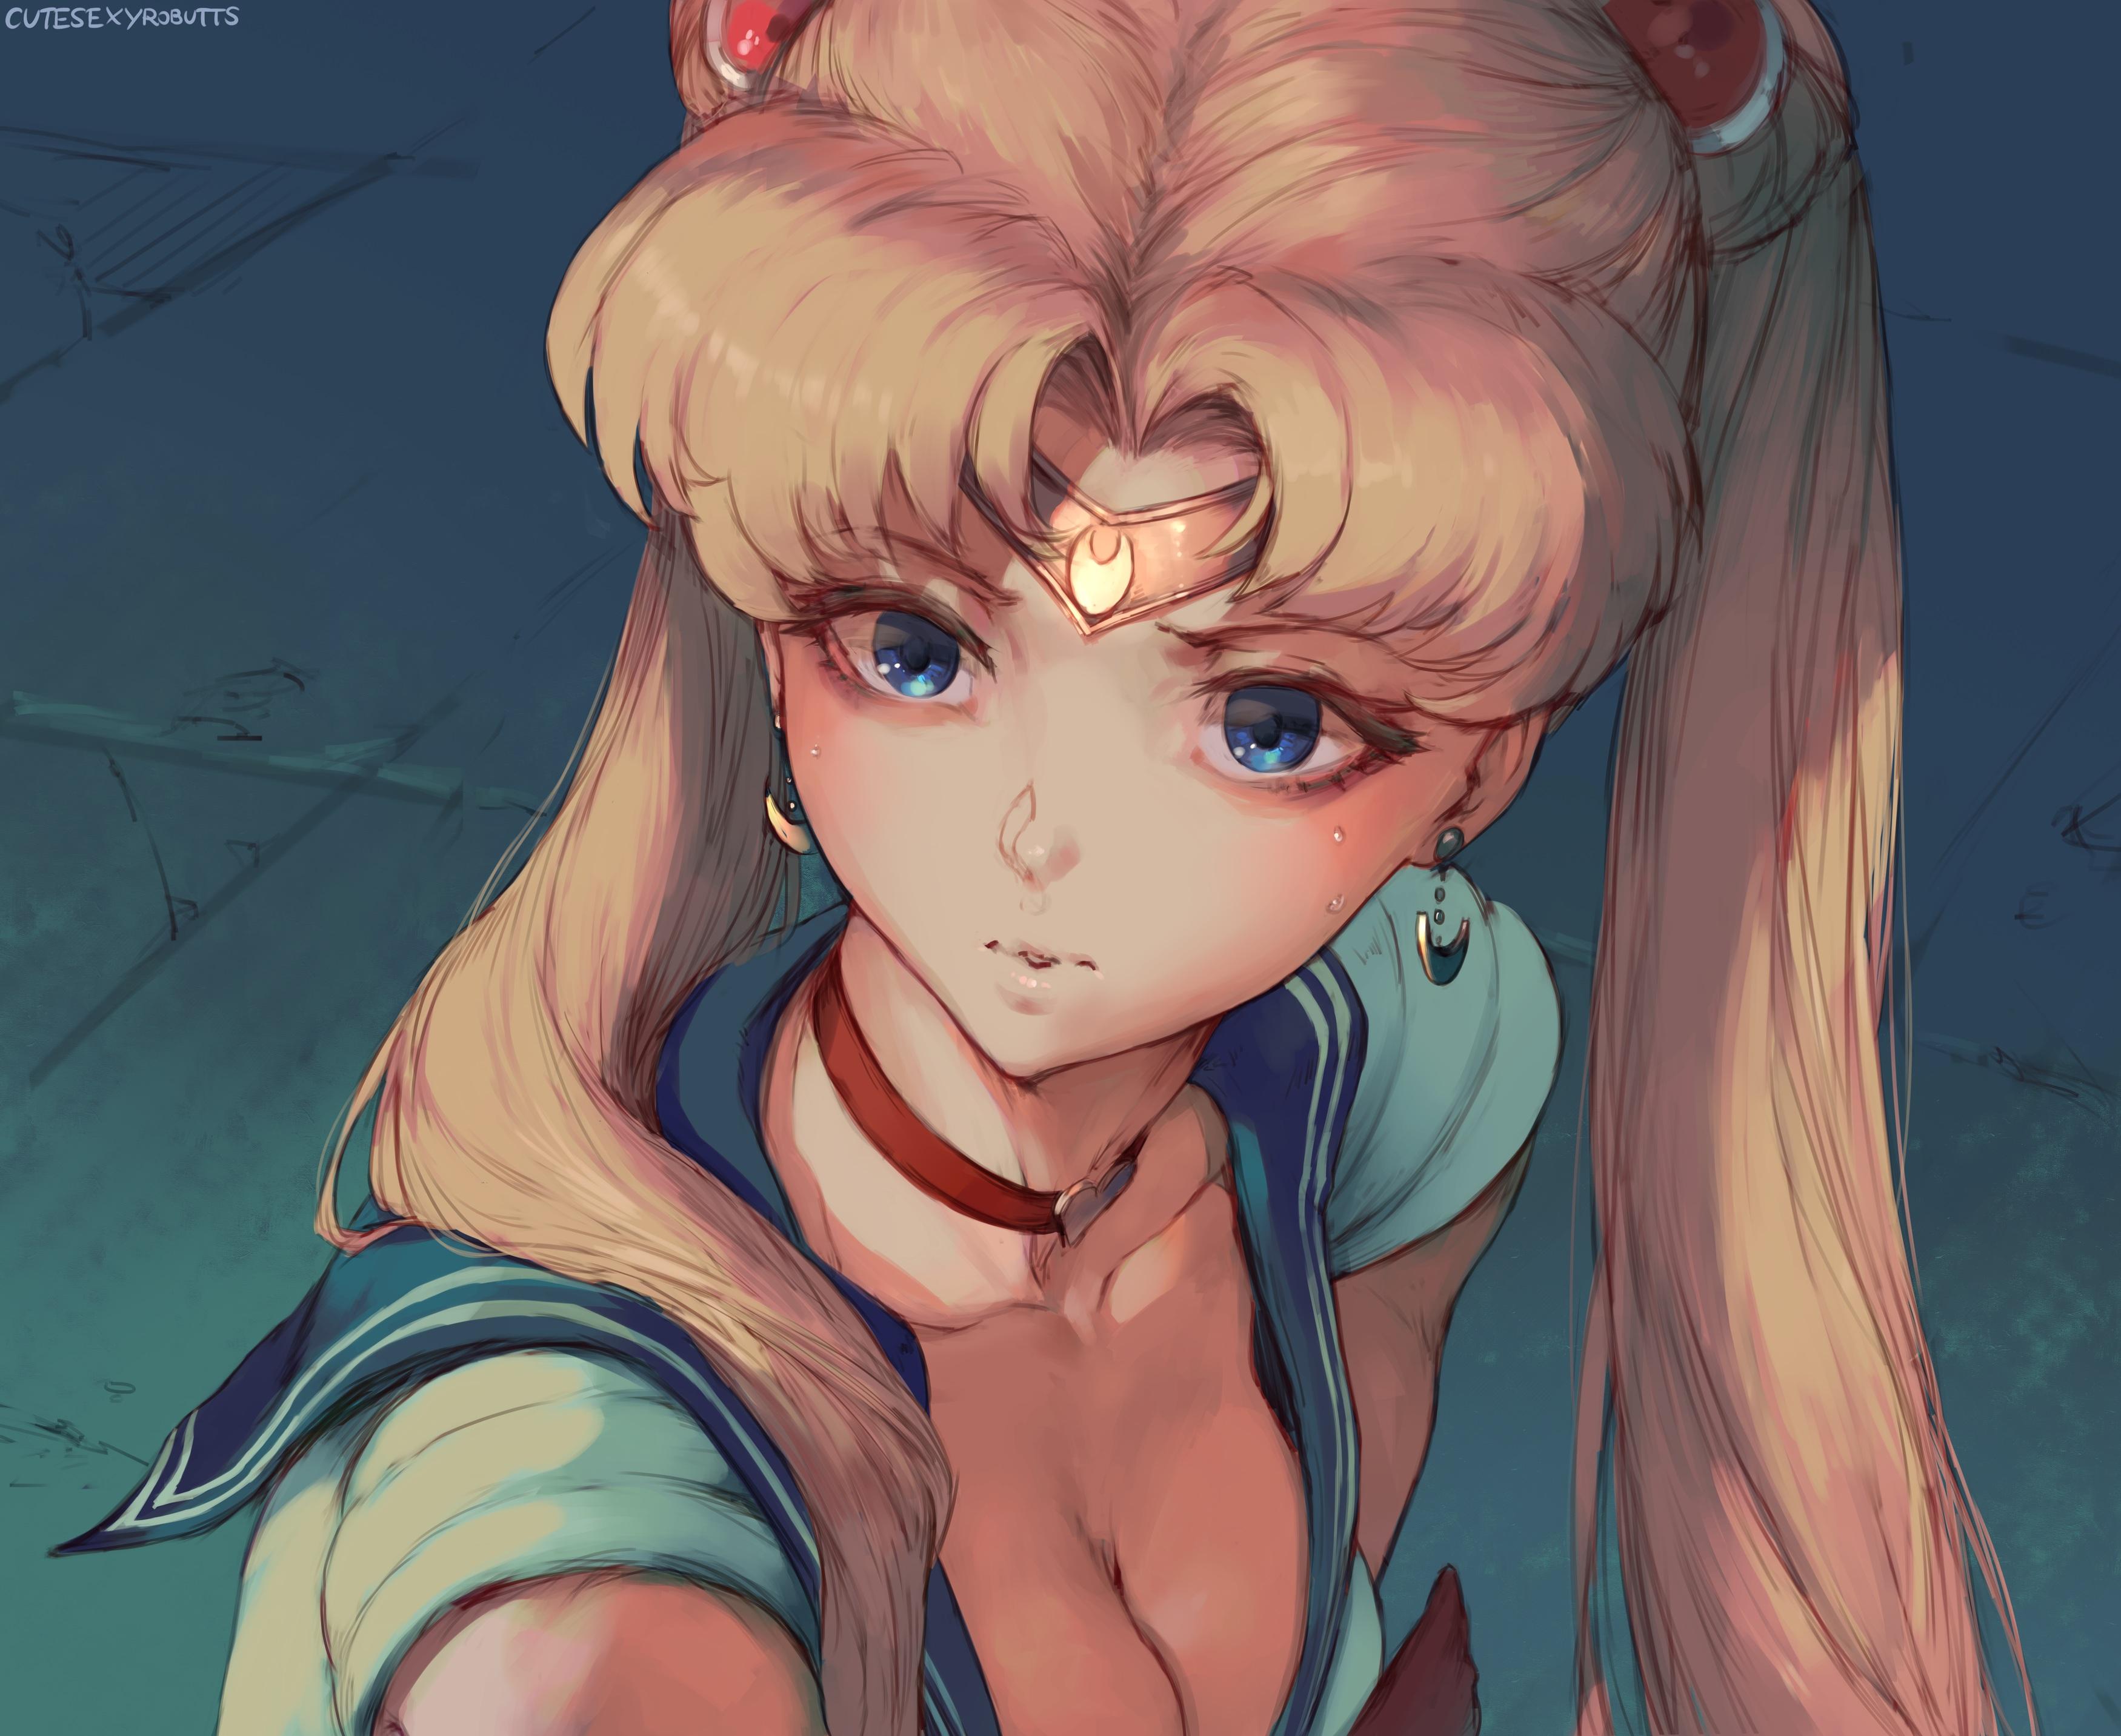 Anime 3500x2865 Cutesexyrobutts Sailor Moon Tsukino Usagi twintails blue eyes long hair collar choker school uniform parody cleavage headband anime girls crying small boobs 2D fan art looking away no bra blonde